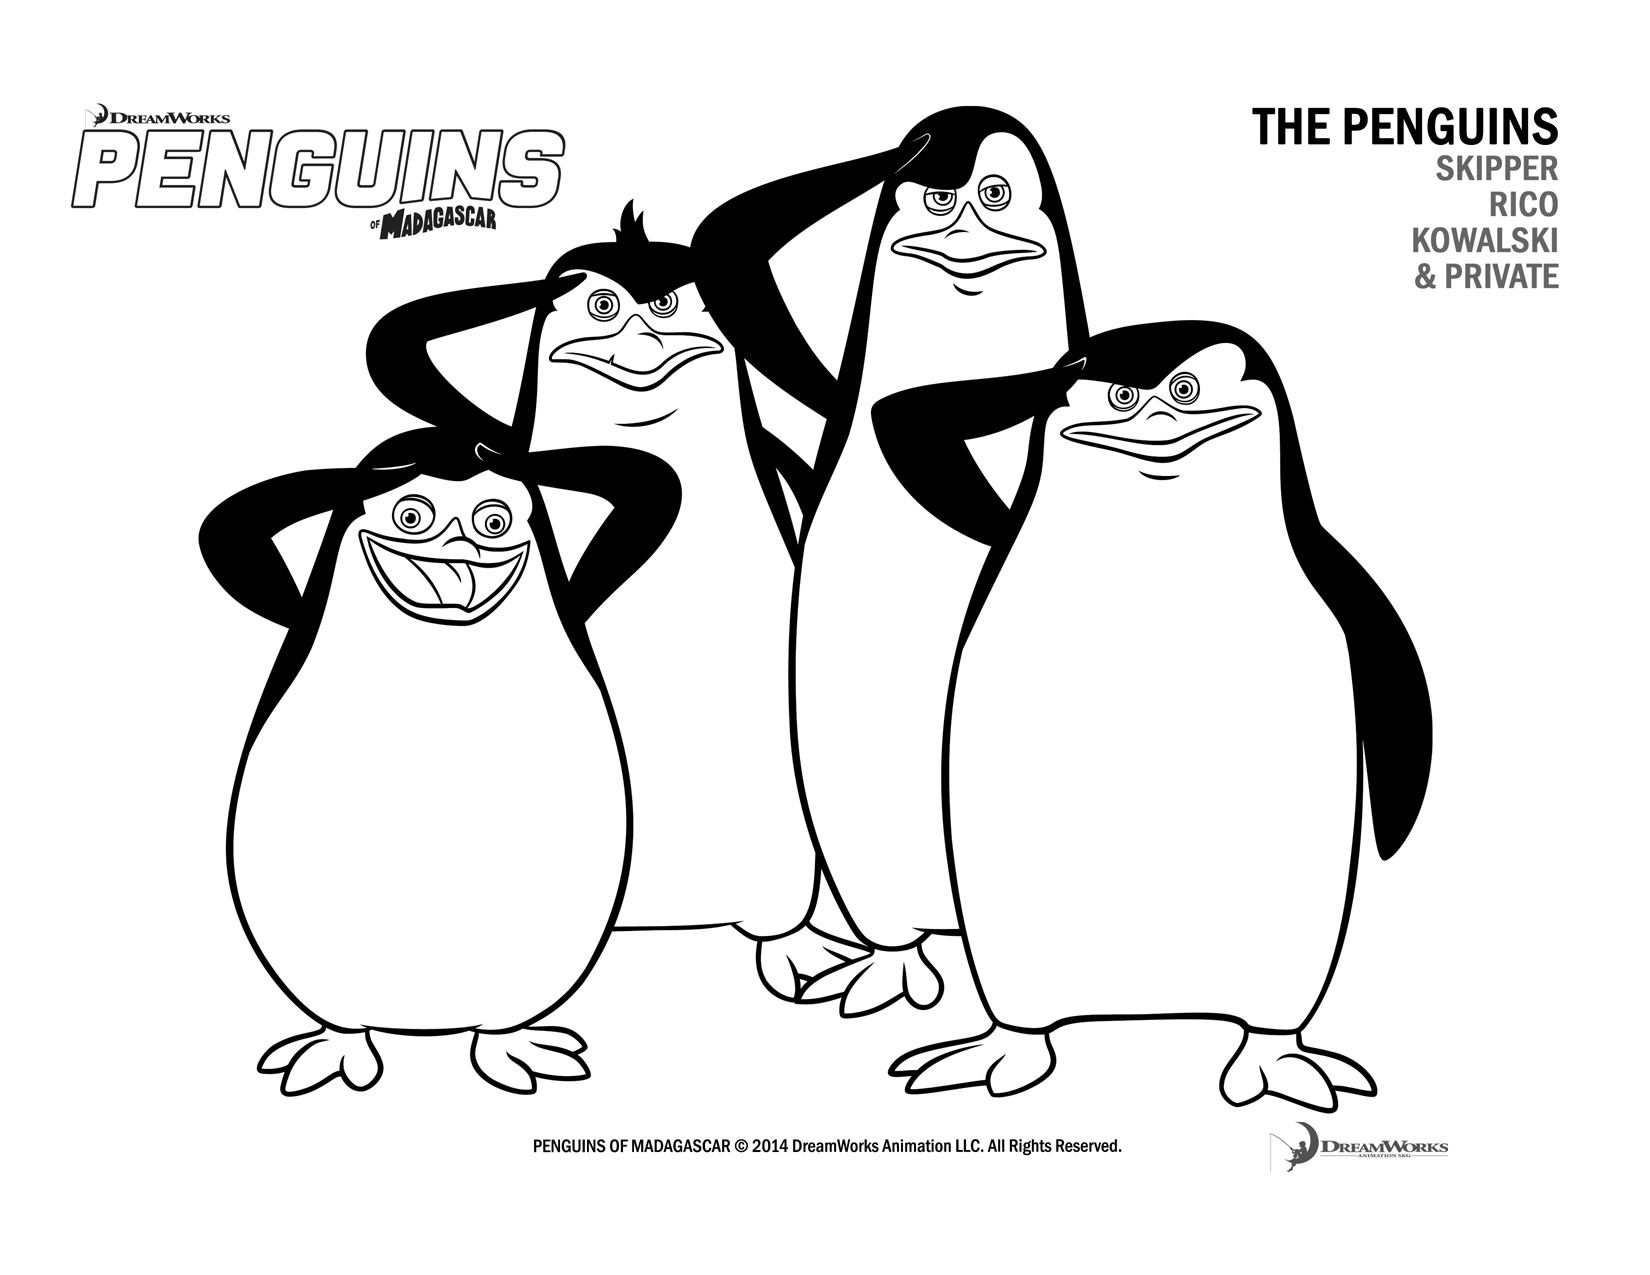 1650x1275 North Pole Friends Penguins Coloring Pages 30 Pictures Cliparts